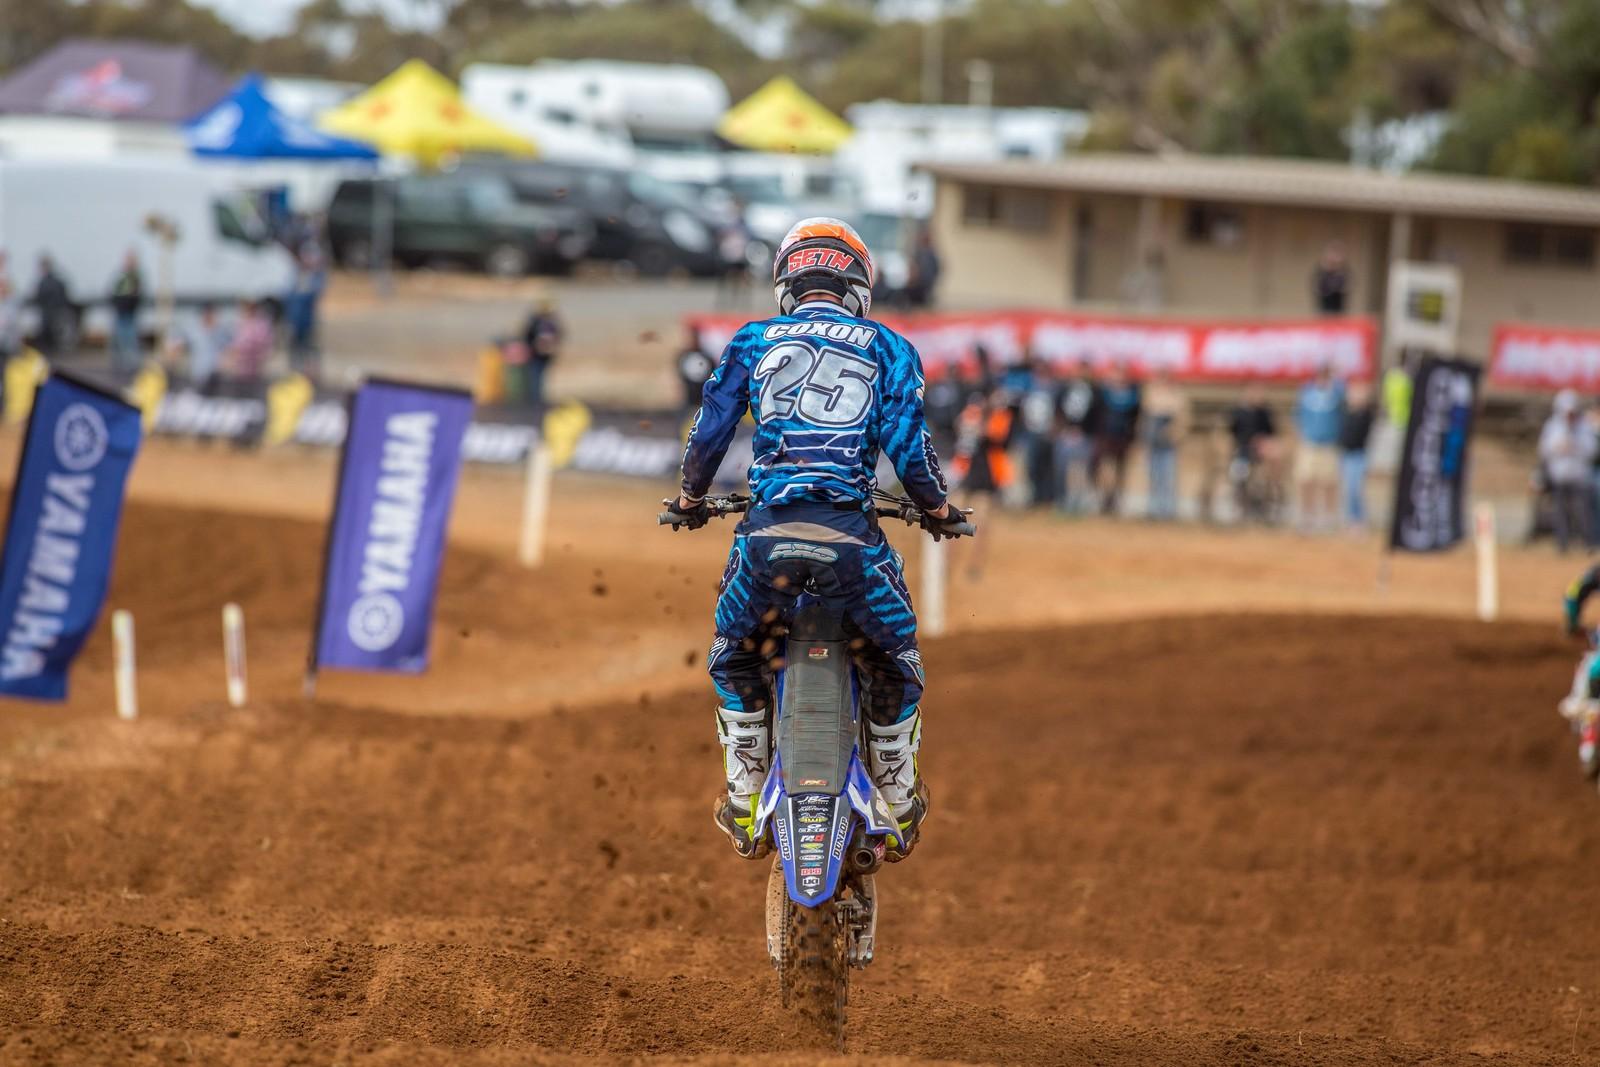 Bailey Coxon - Australian Motul Mx Championships: Round 4, Murray Bridge - Motocross Pictures - Vital MX